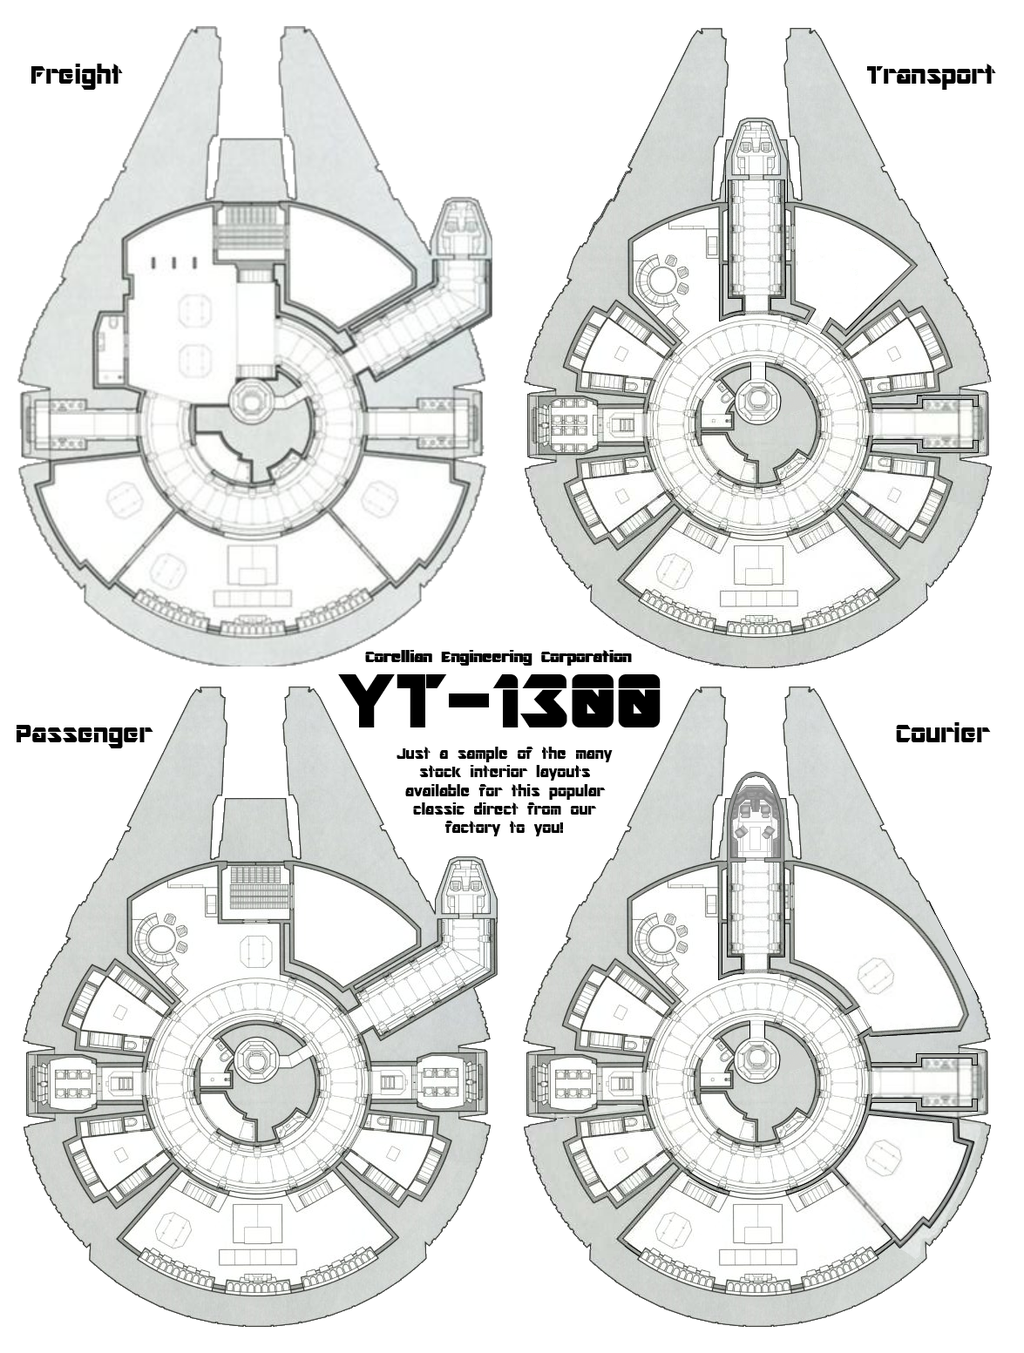 yt_1300_deckplan_variations_by_reiko_foxx-d7e3xts